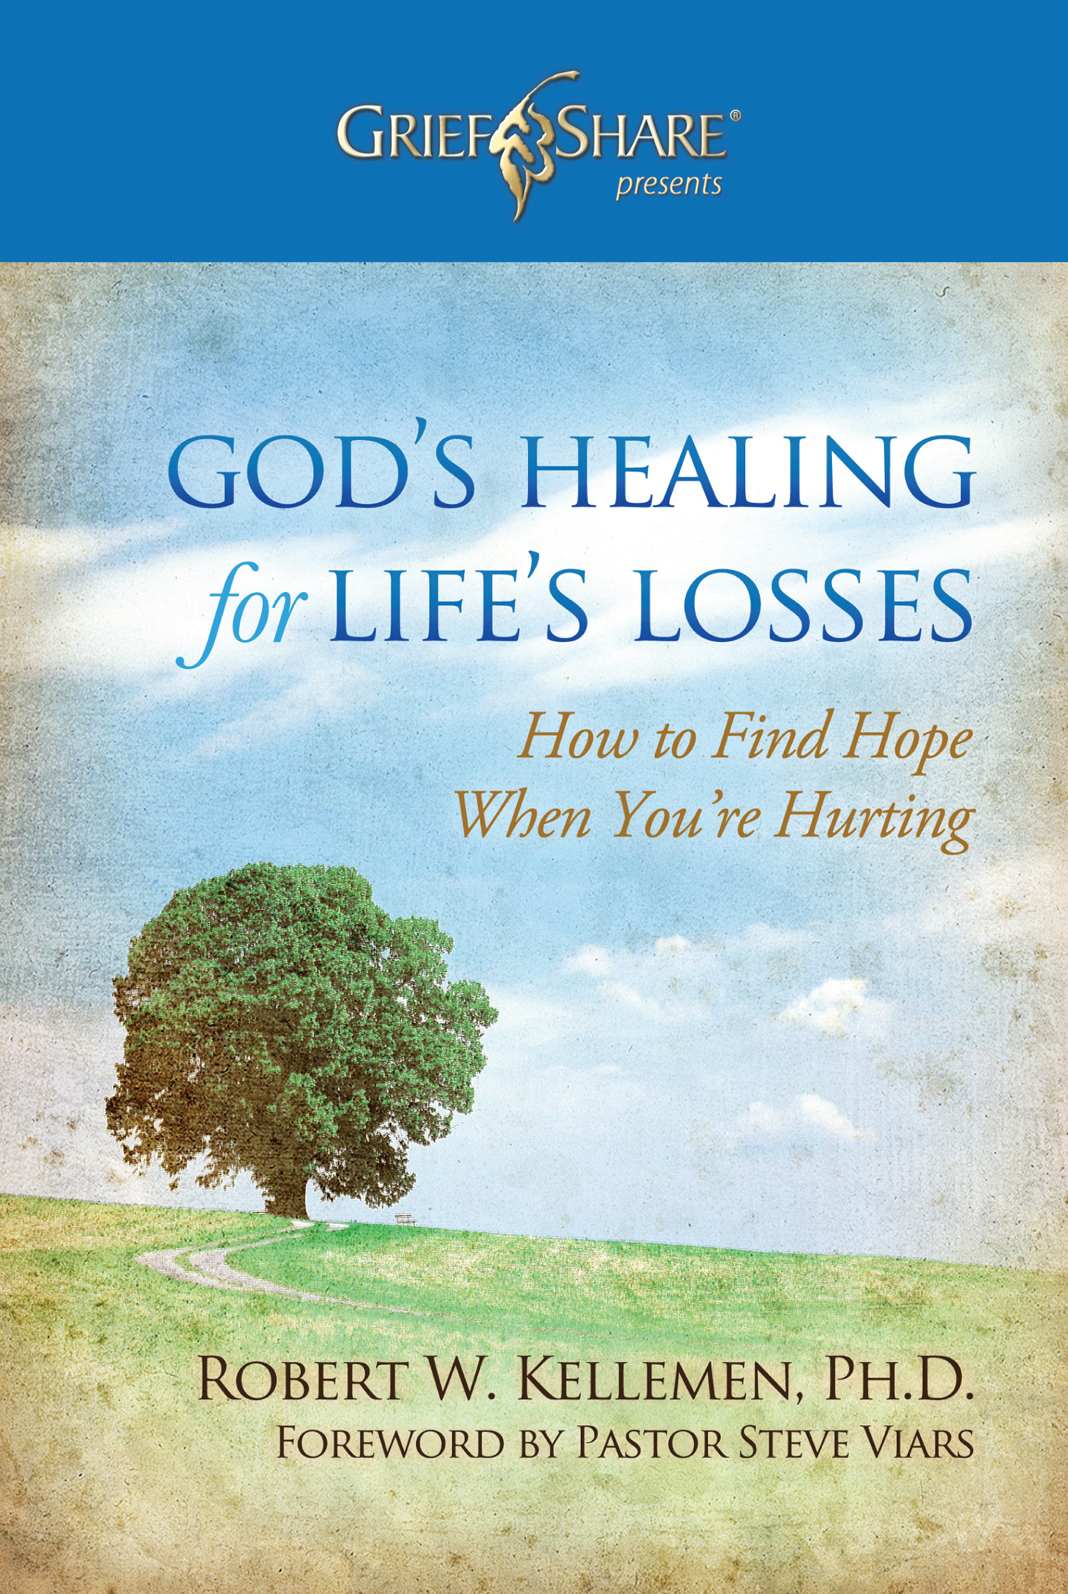 God's Healing for Life's Losses